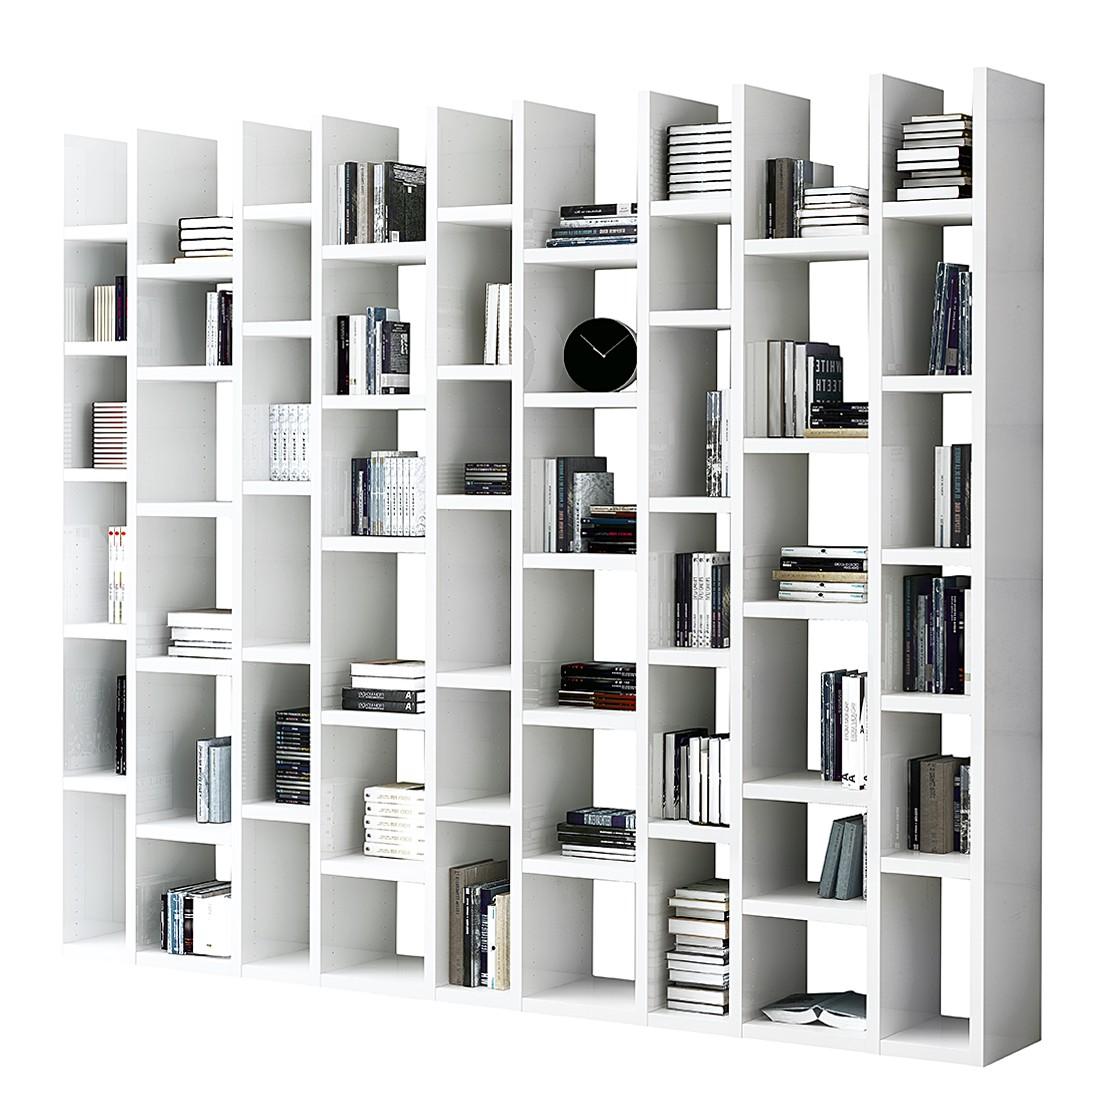 b cherregal weiss hochglanz preisvergleiche. Black Bedroom Furniture Sets. Home Design Ideas